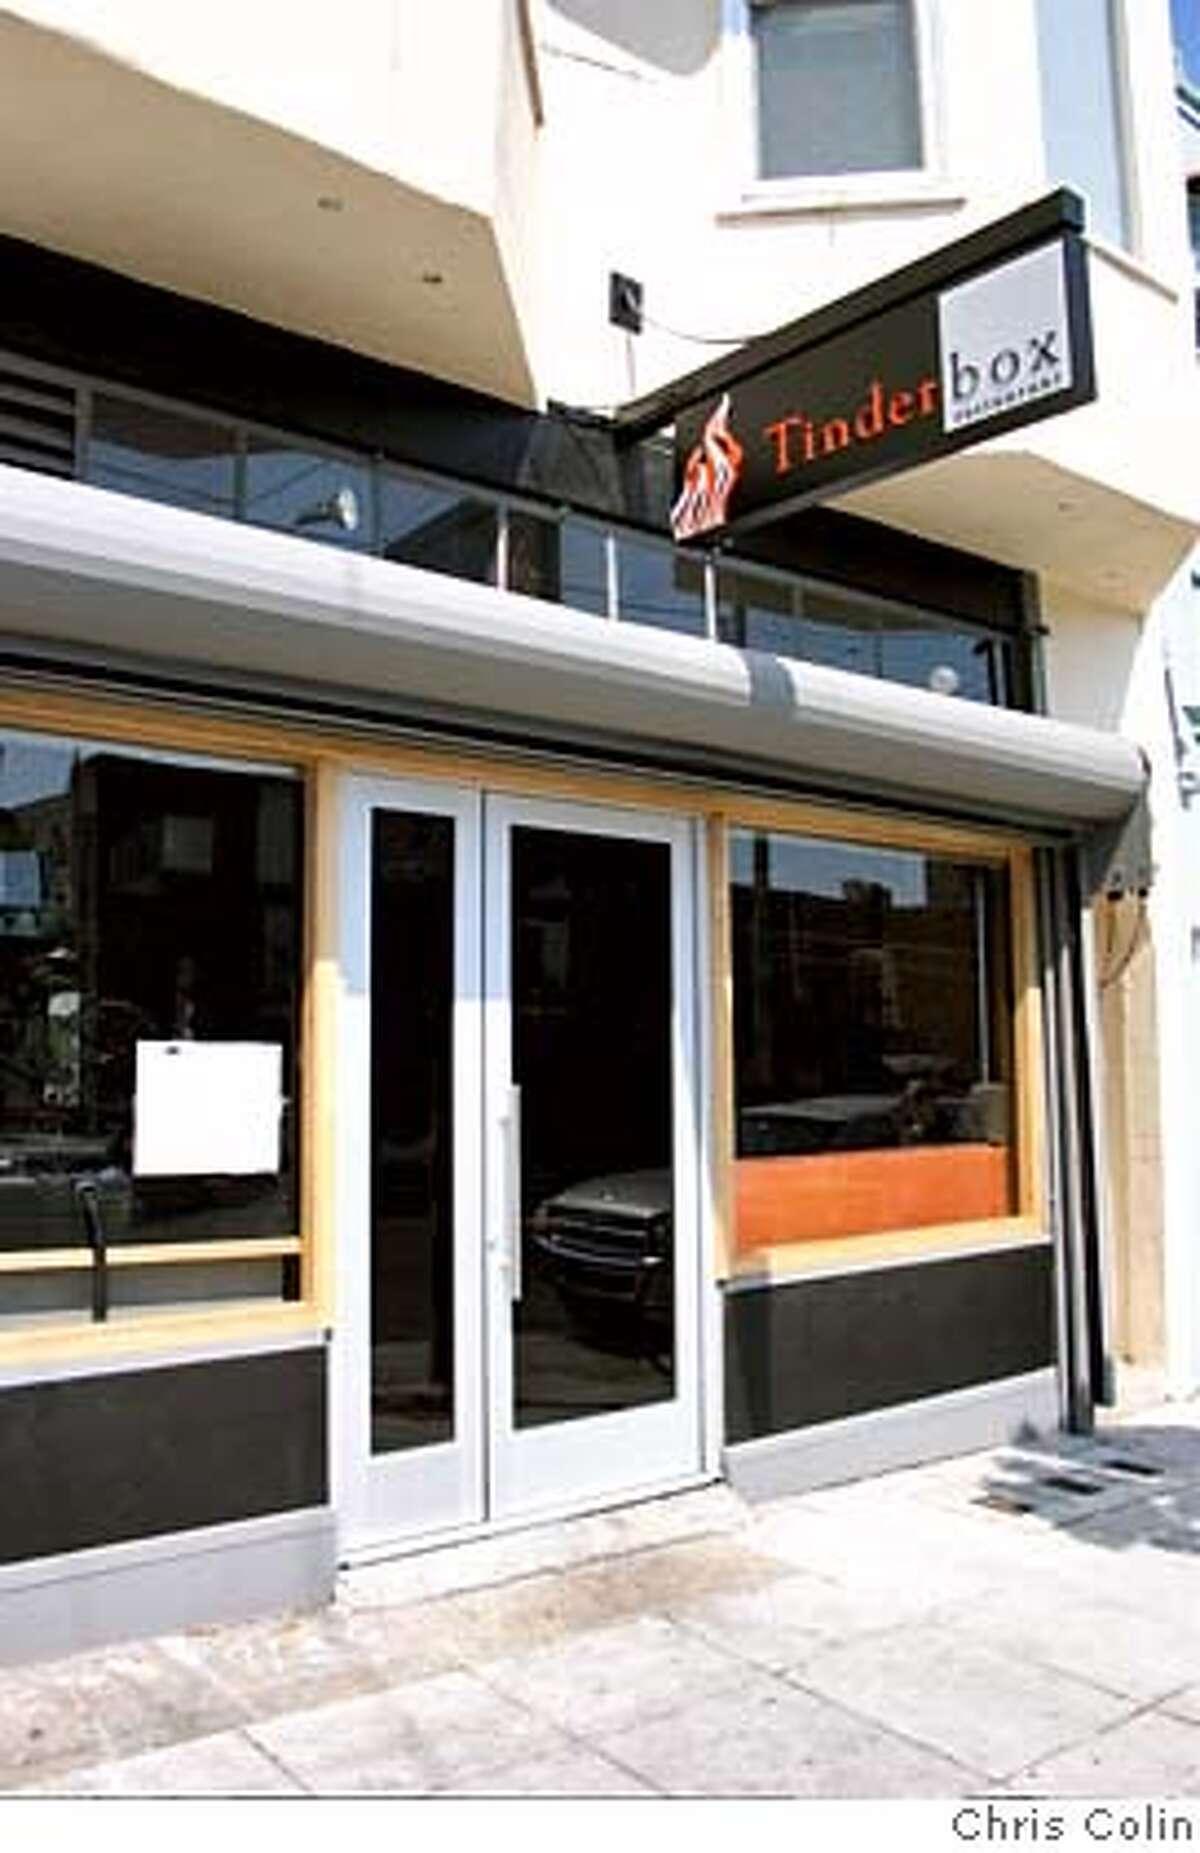 Tinderbox restaurant, 803 Cortland Avenue, San Francisco.